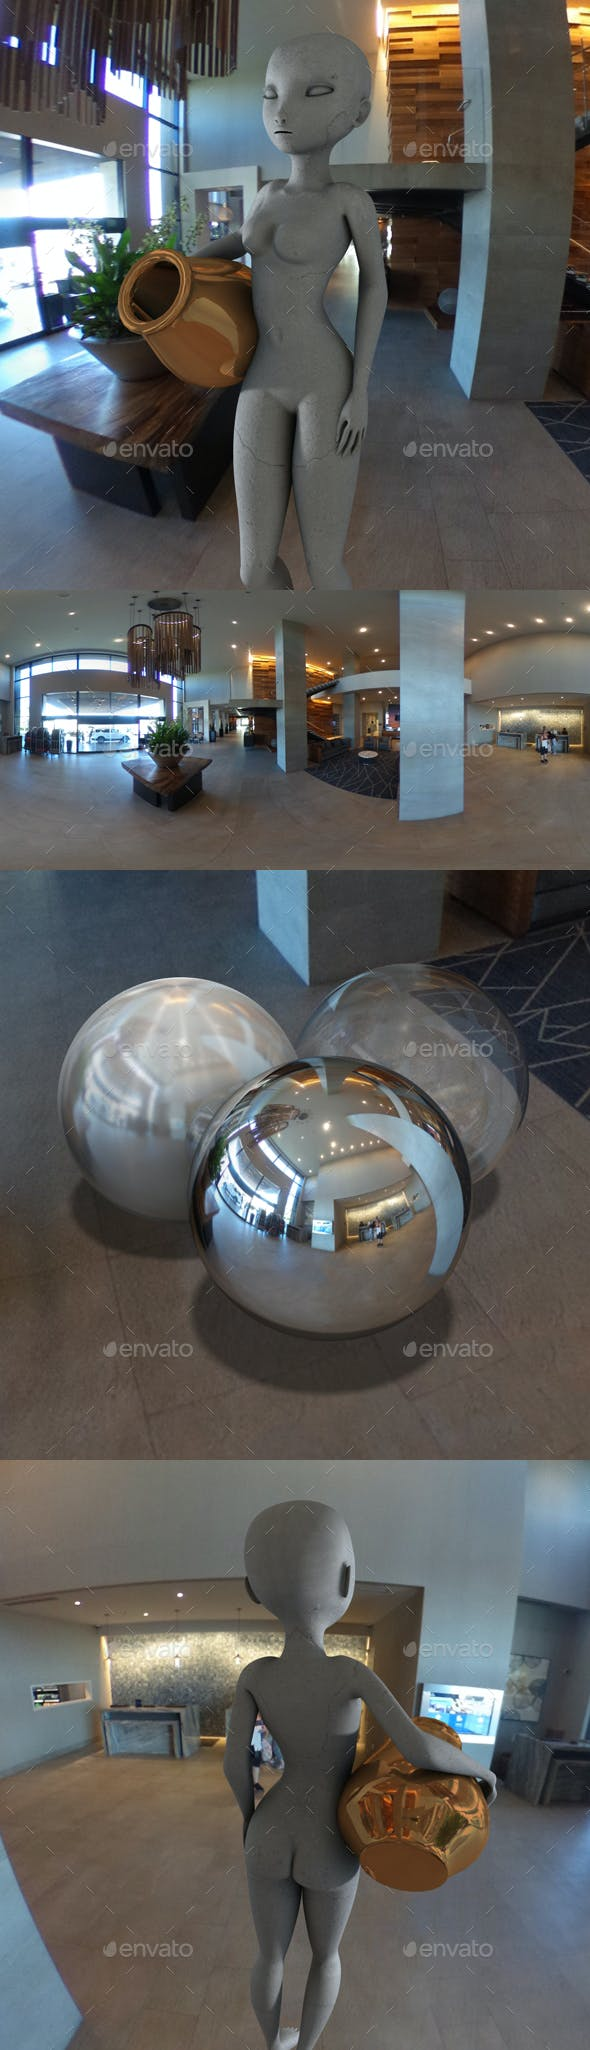 Modern Hotel Lobby HDRI - 3DOcean Item for Sale